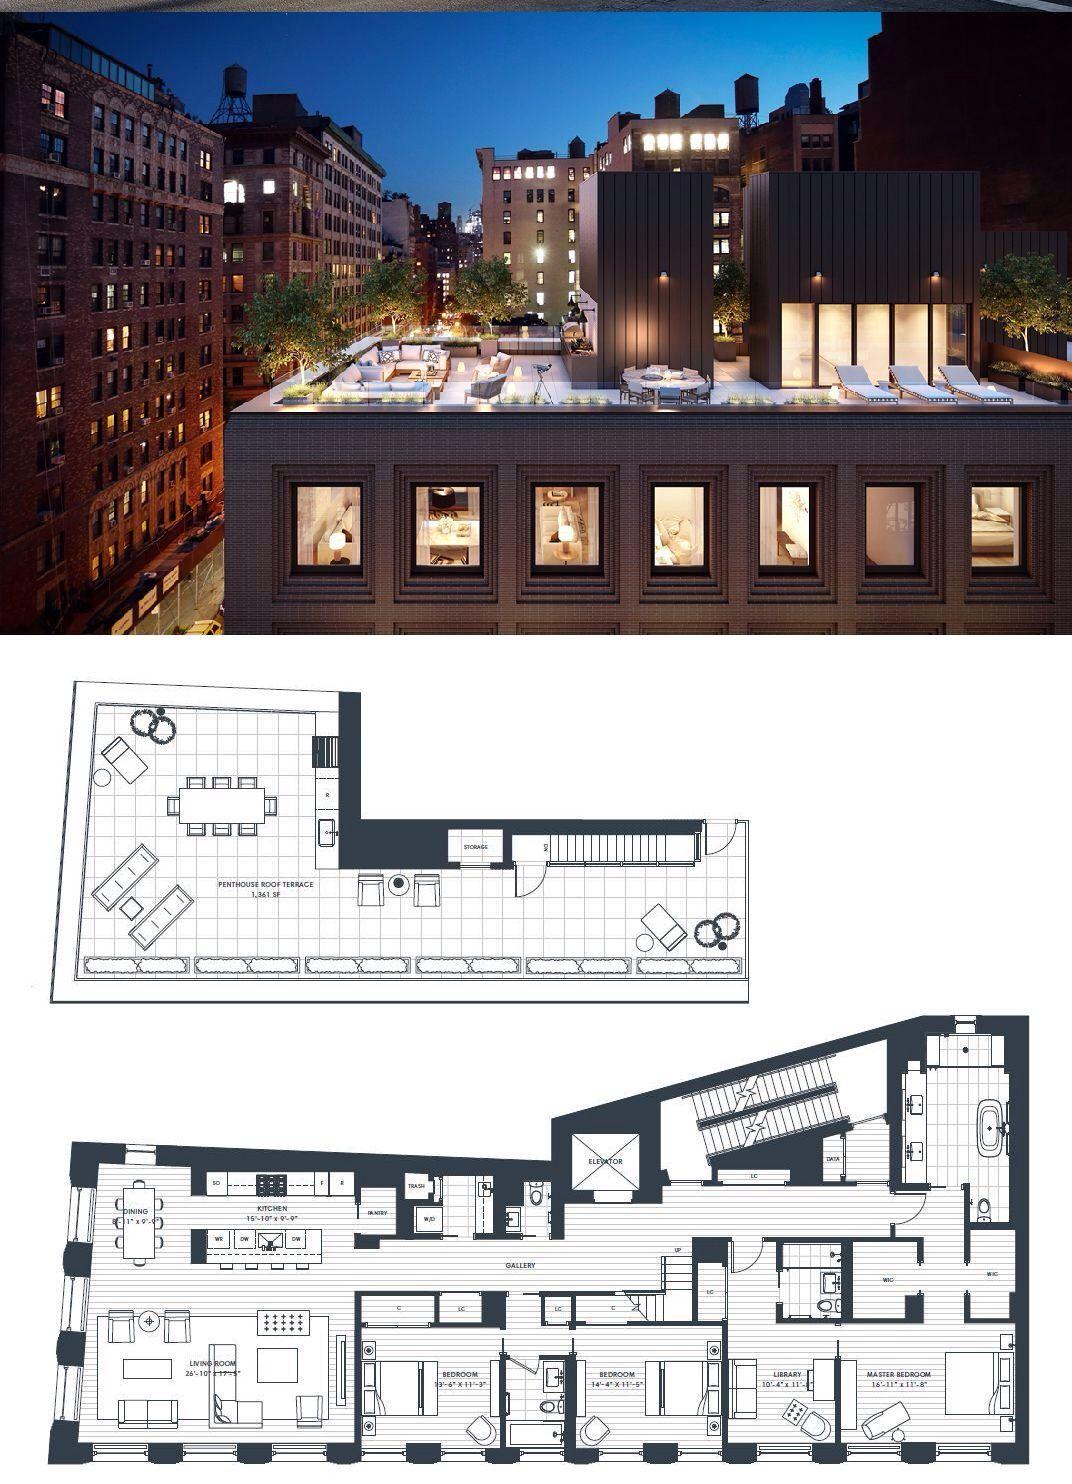 116 university place penthouse townhouse apartments new york apartments apartment floor plans apartment